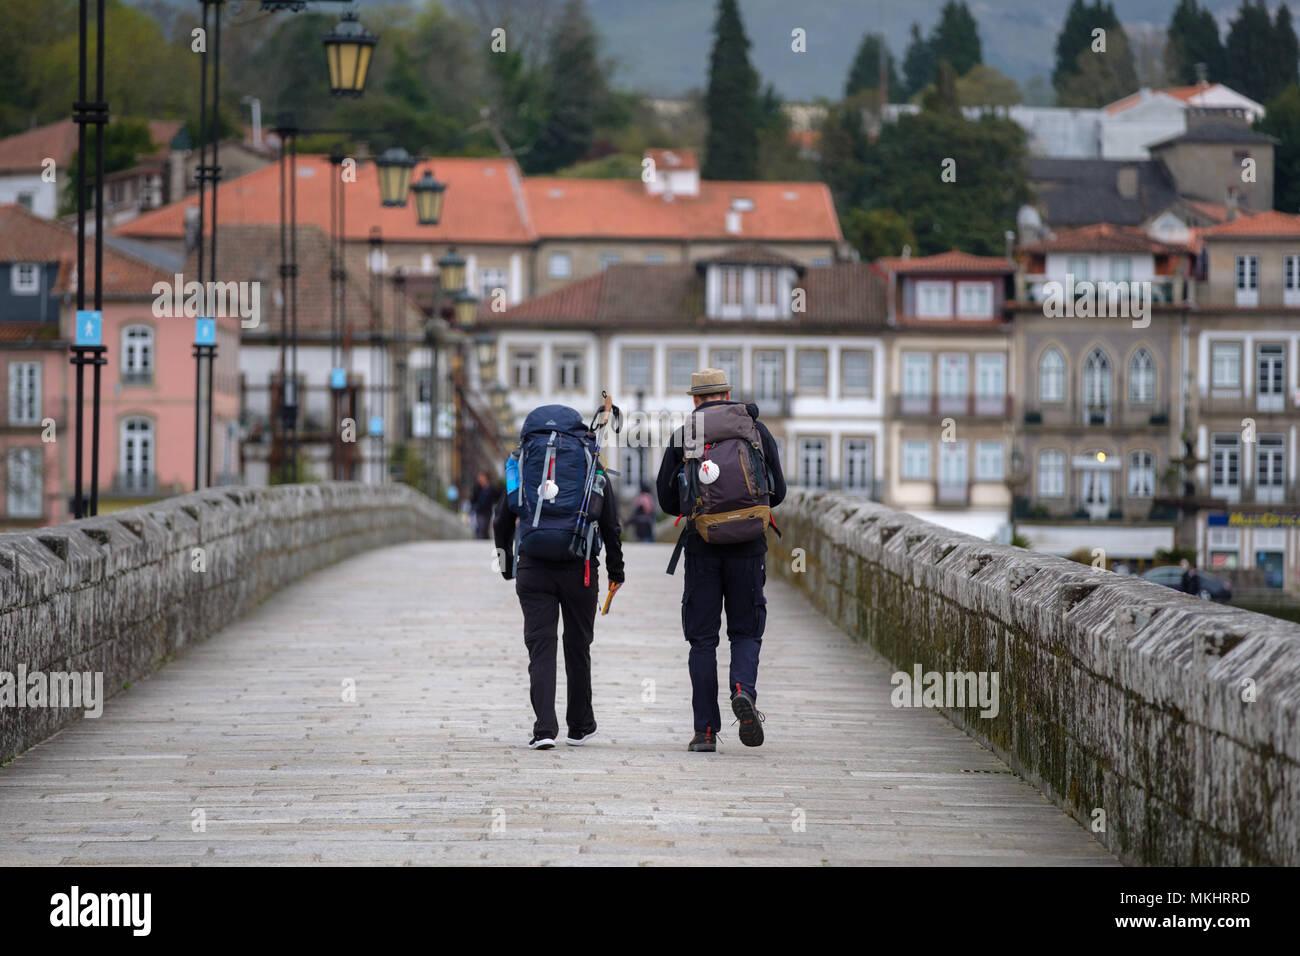 Rear view of two pilgrims heading to Santiago de Compostela using the portuguese way, Ponte de Lima, Portugal Stock Photo